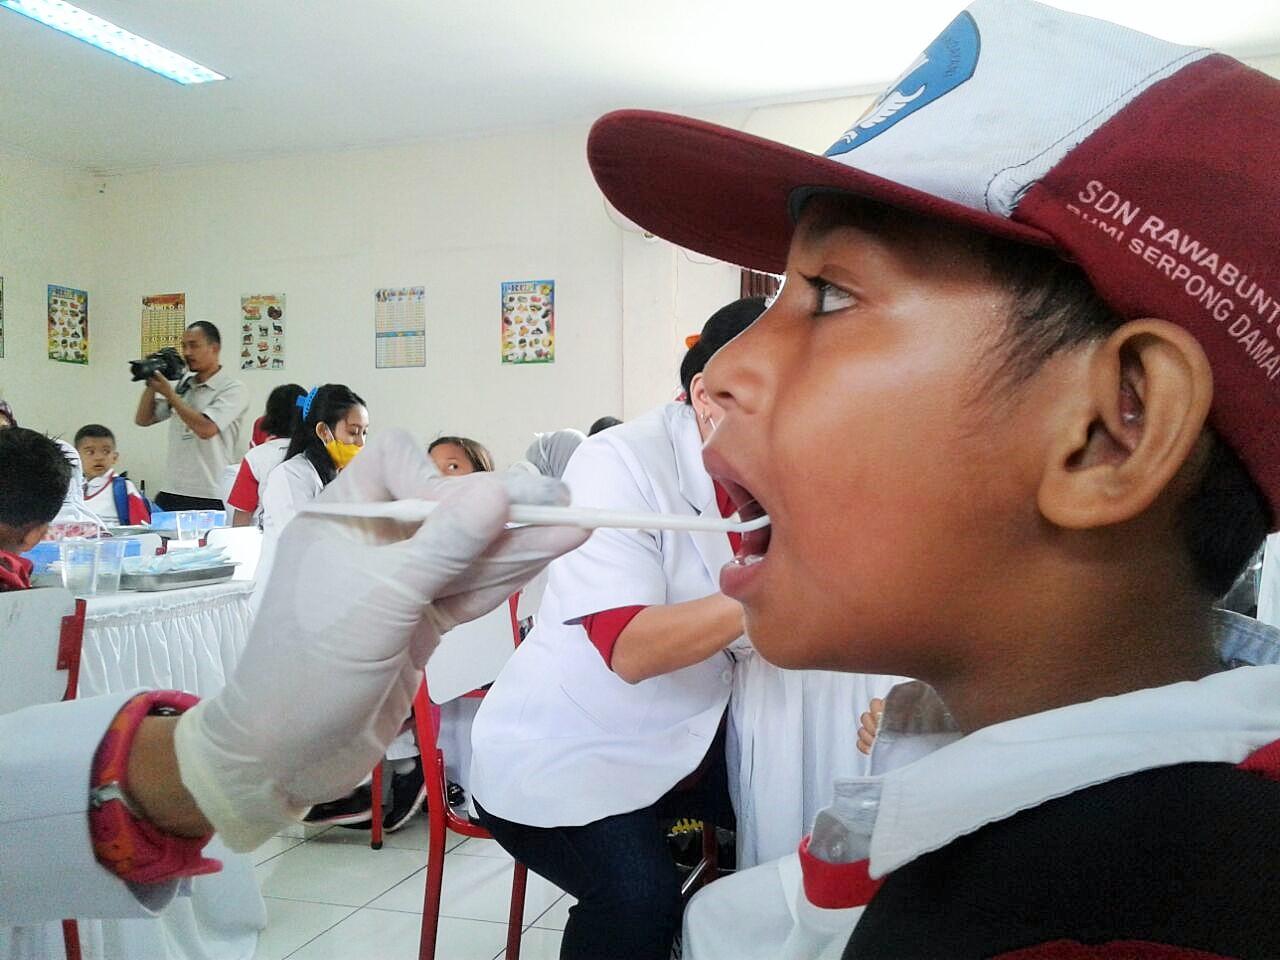 Seorang Siswa tengah diperiksa gigi pada Peringatan Hari Gigi dan Mulut Sedunia di SDN Rawa Buntu 03, Tangerang Selatan, Senin (20/3)